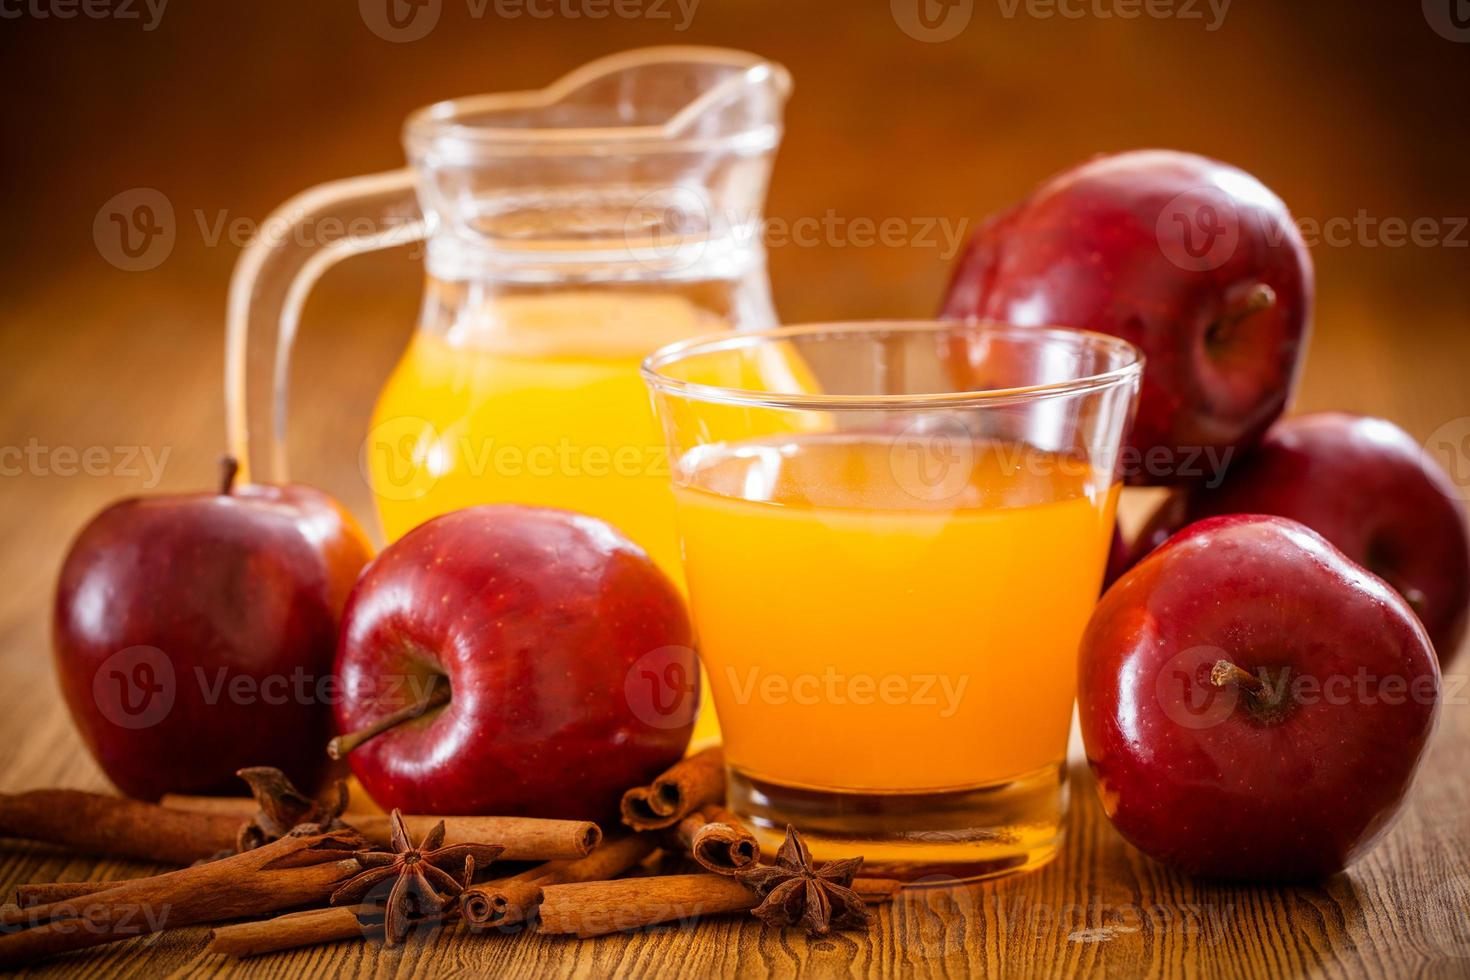 vinagre de maçã foto